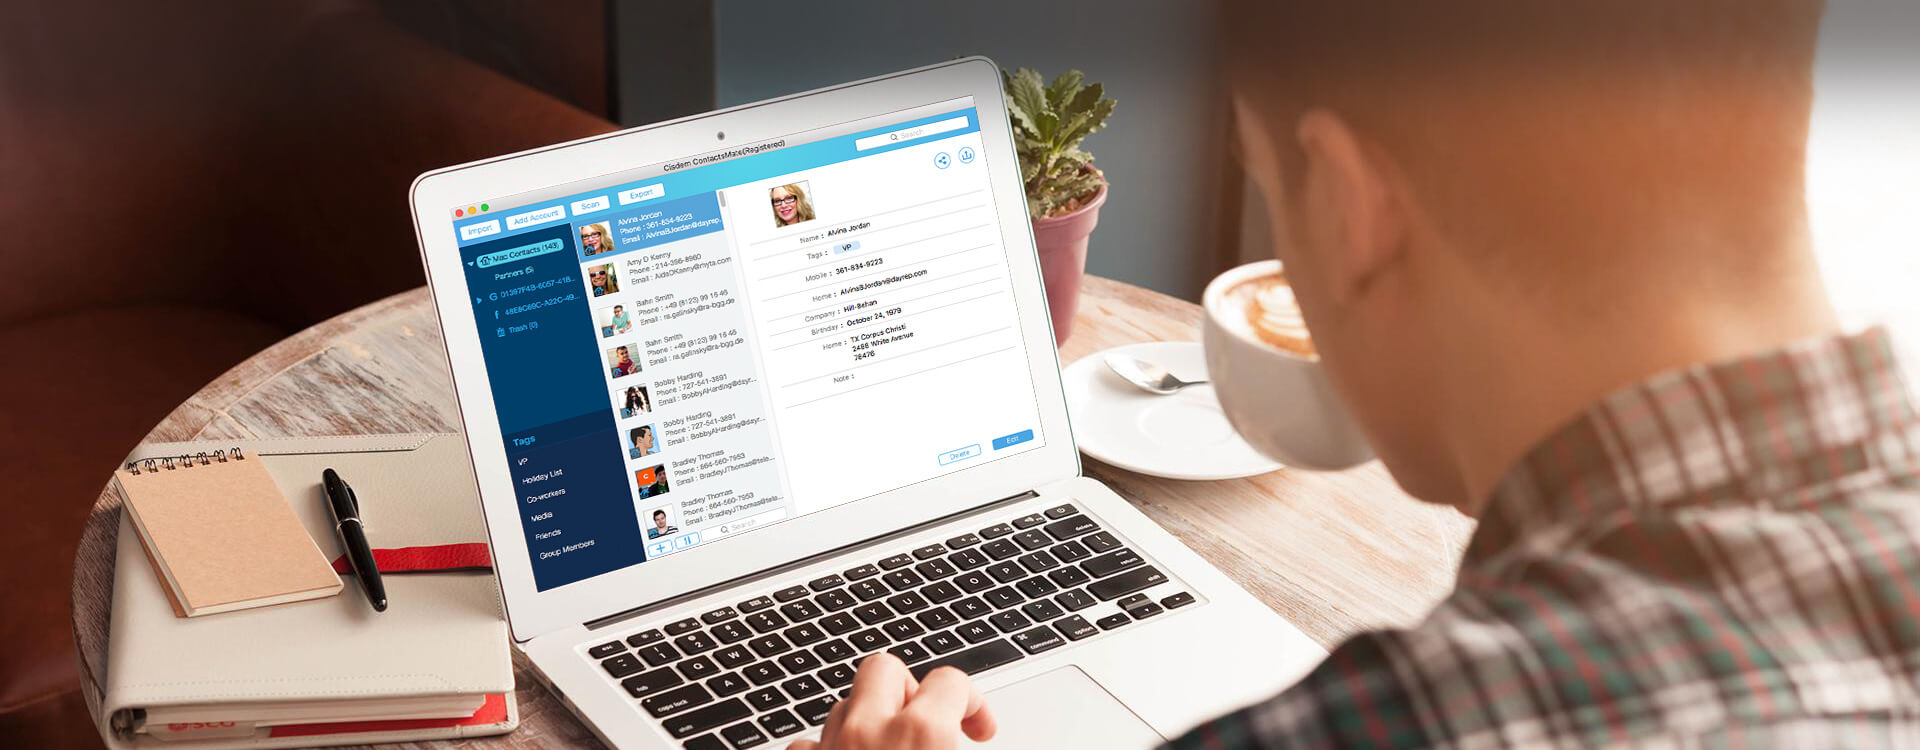 Cisdem ContactsMate for Mac 4.2.0 破解版 – 联系人管理工具-爱情守望者